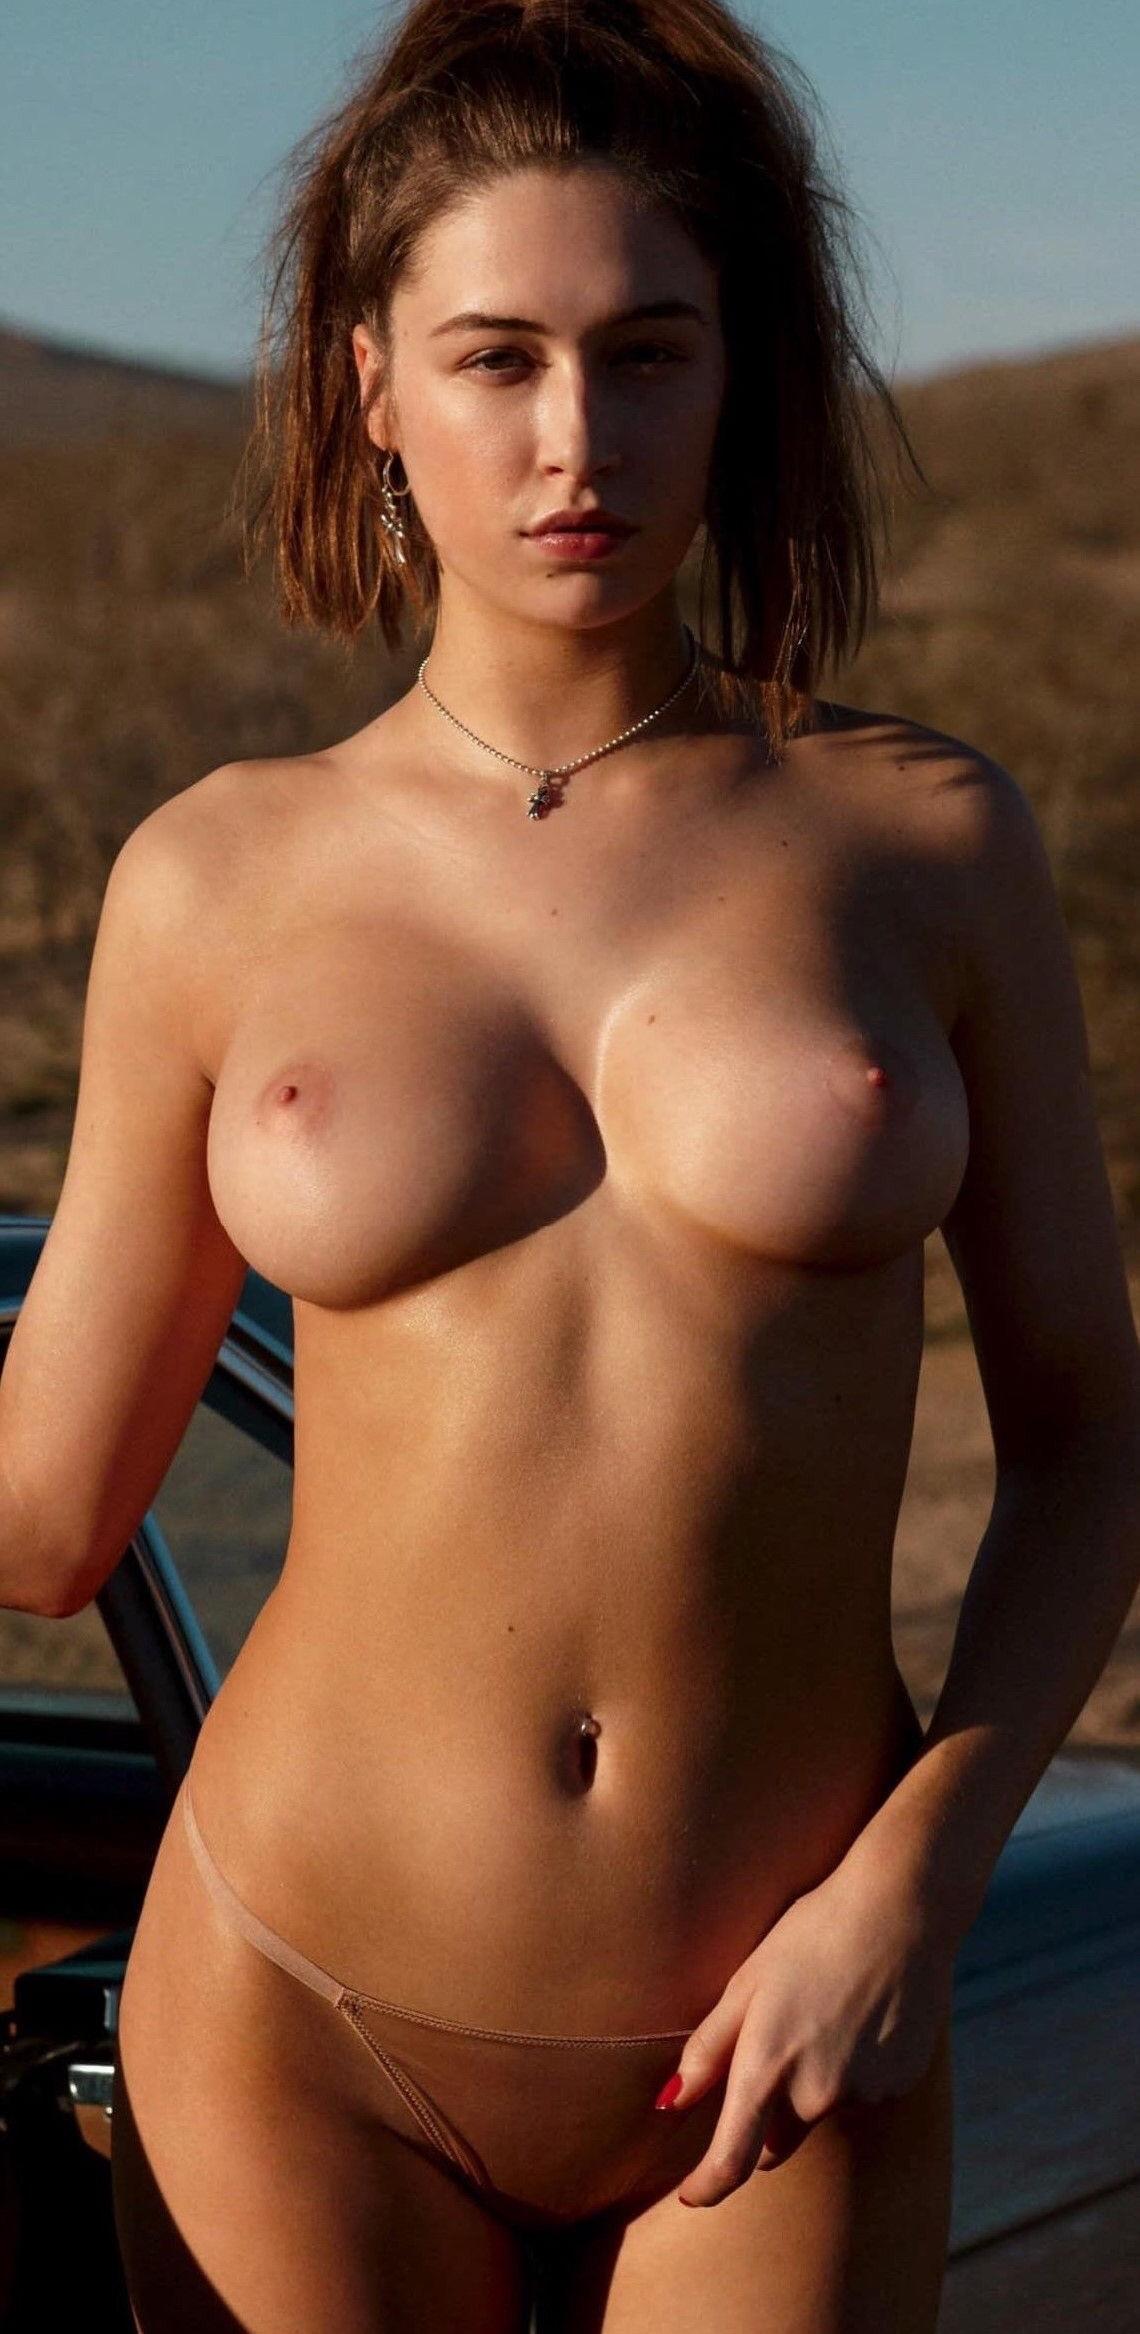 Kendra wilkinson playboy nude-8430